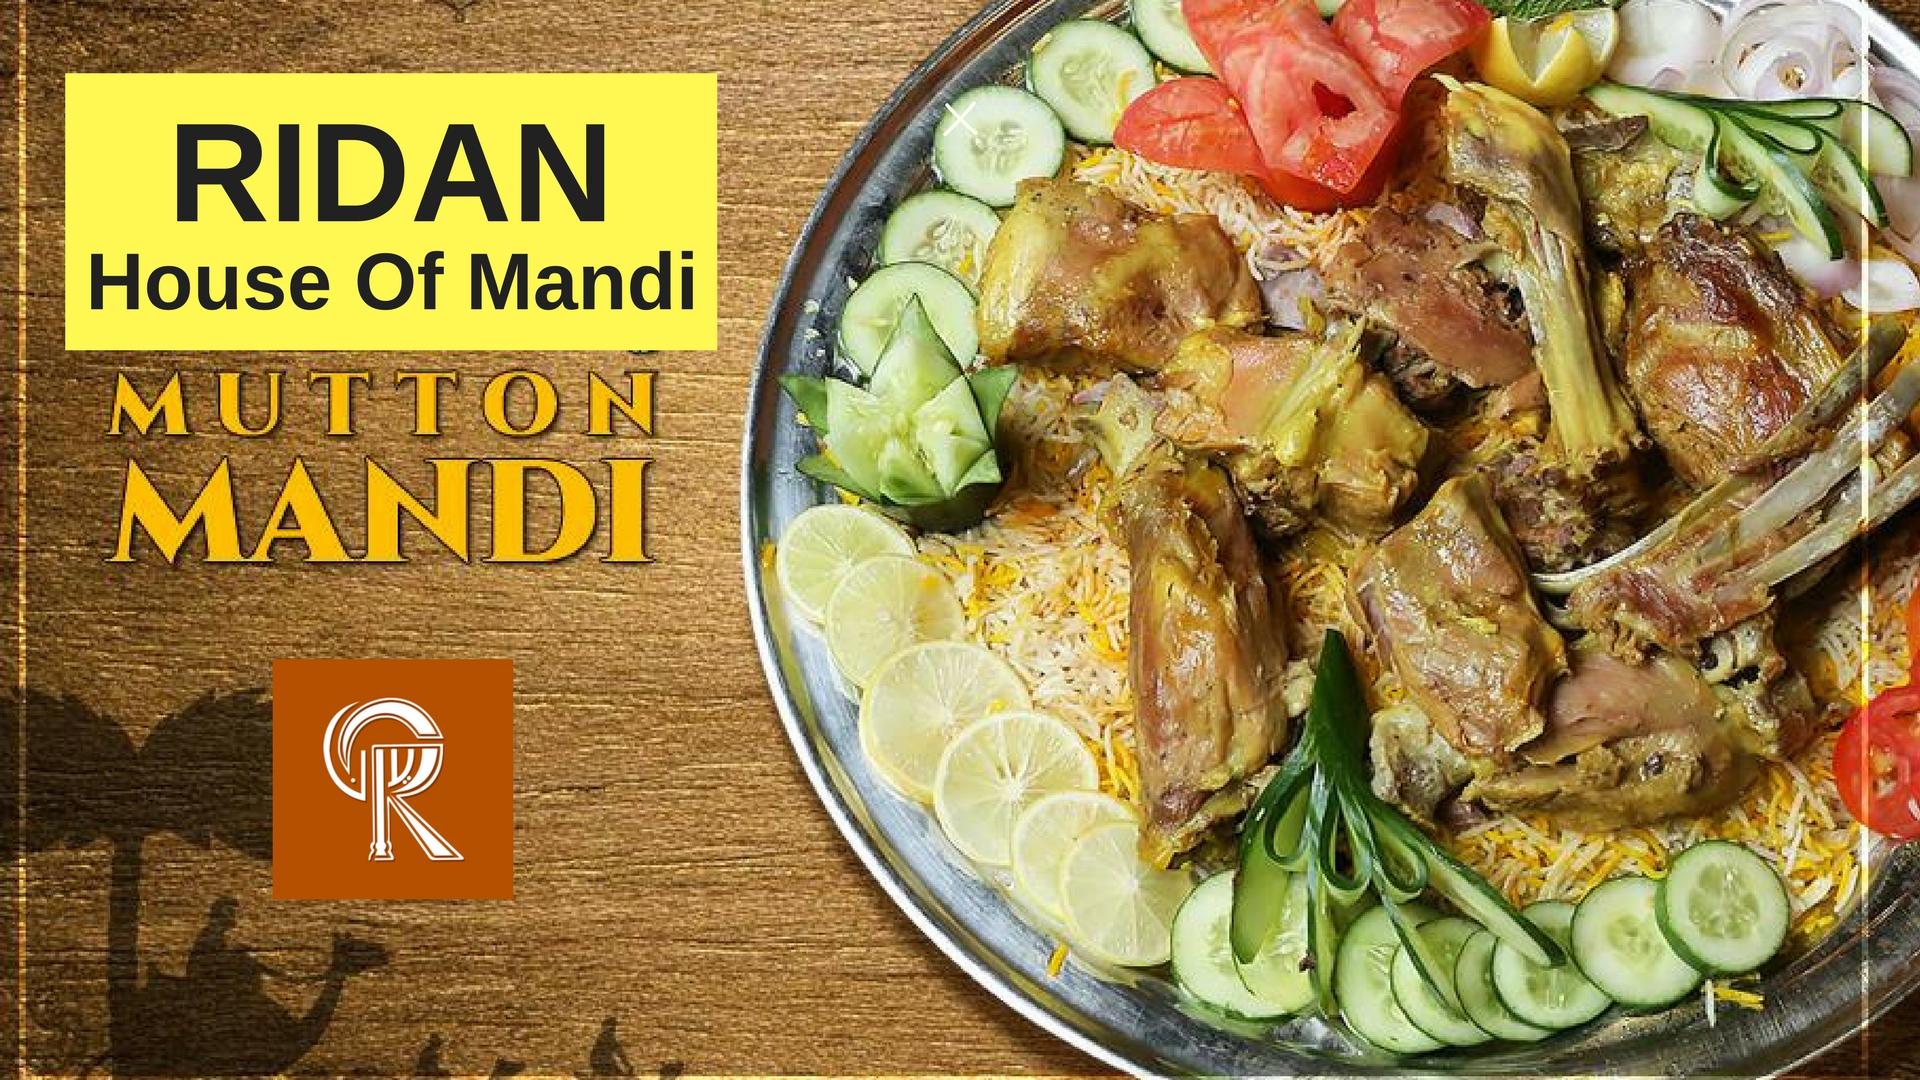 Mnadi served at ridan house of mandi